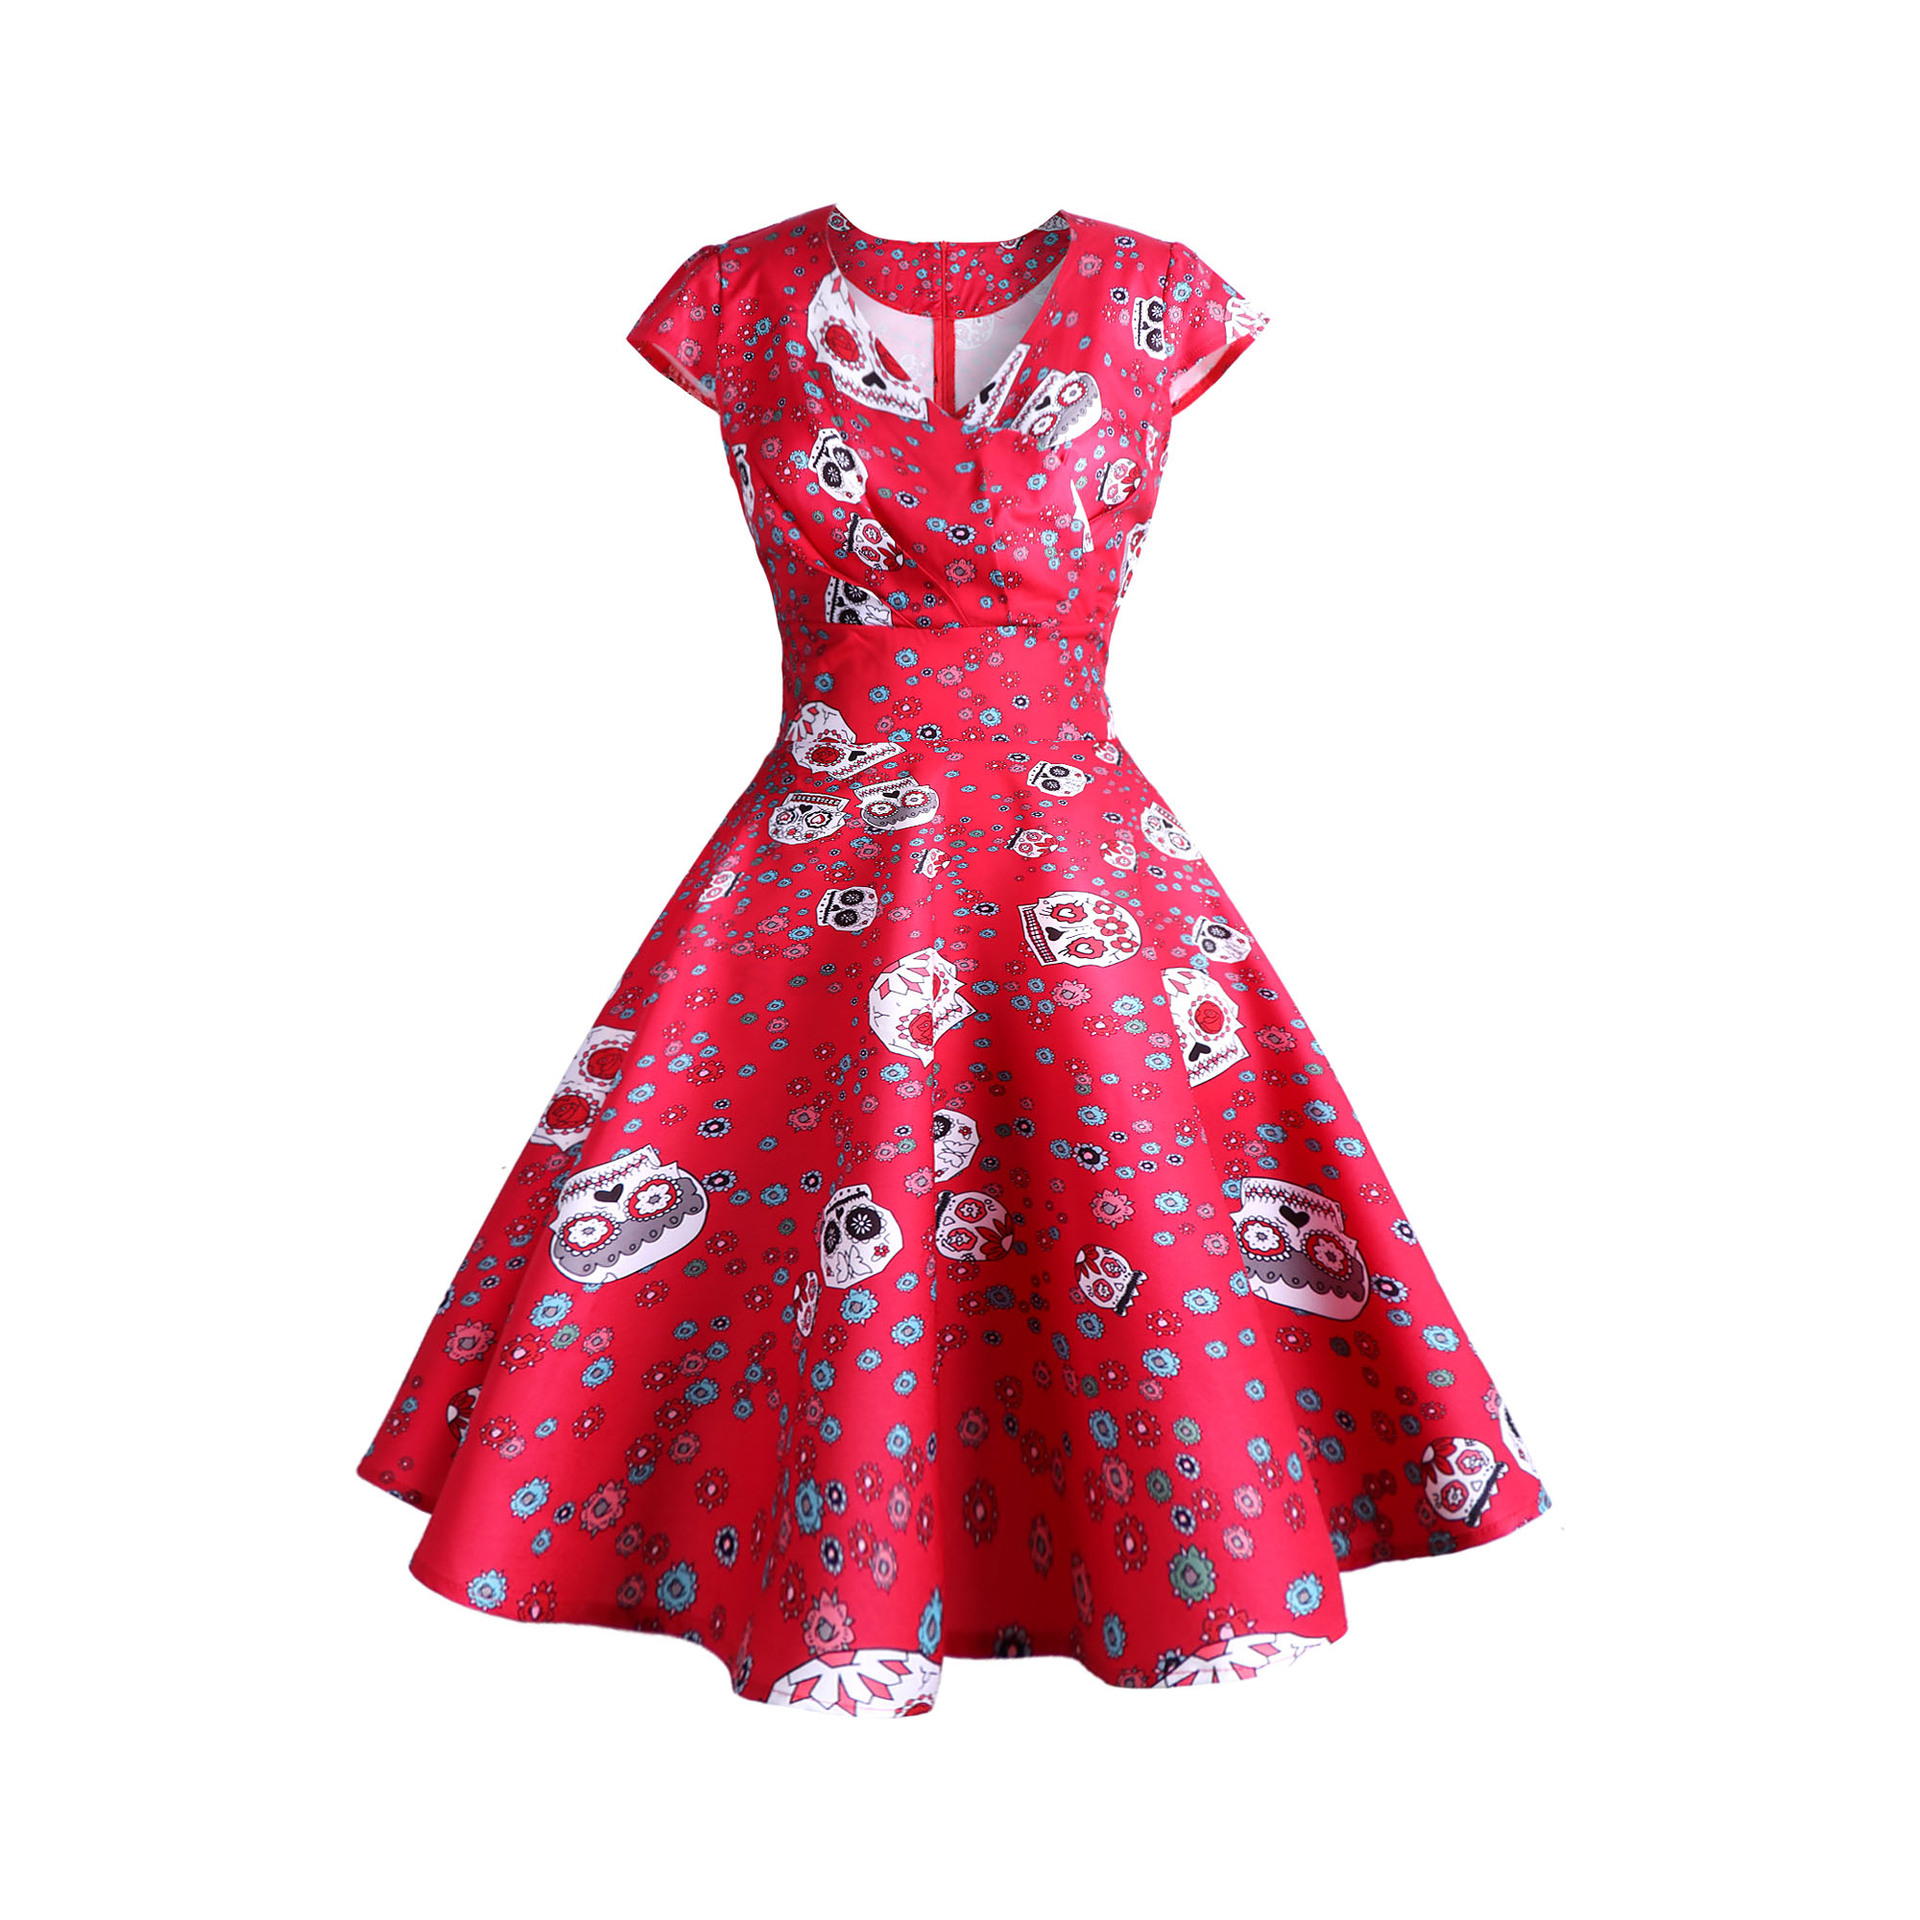 Retro Printed Dress